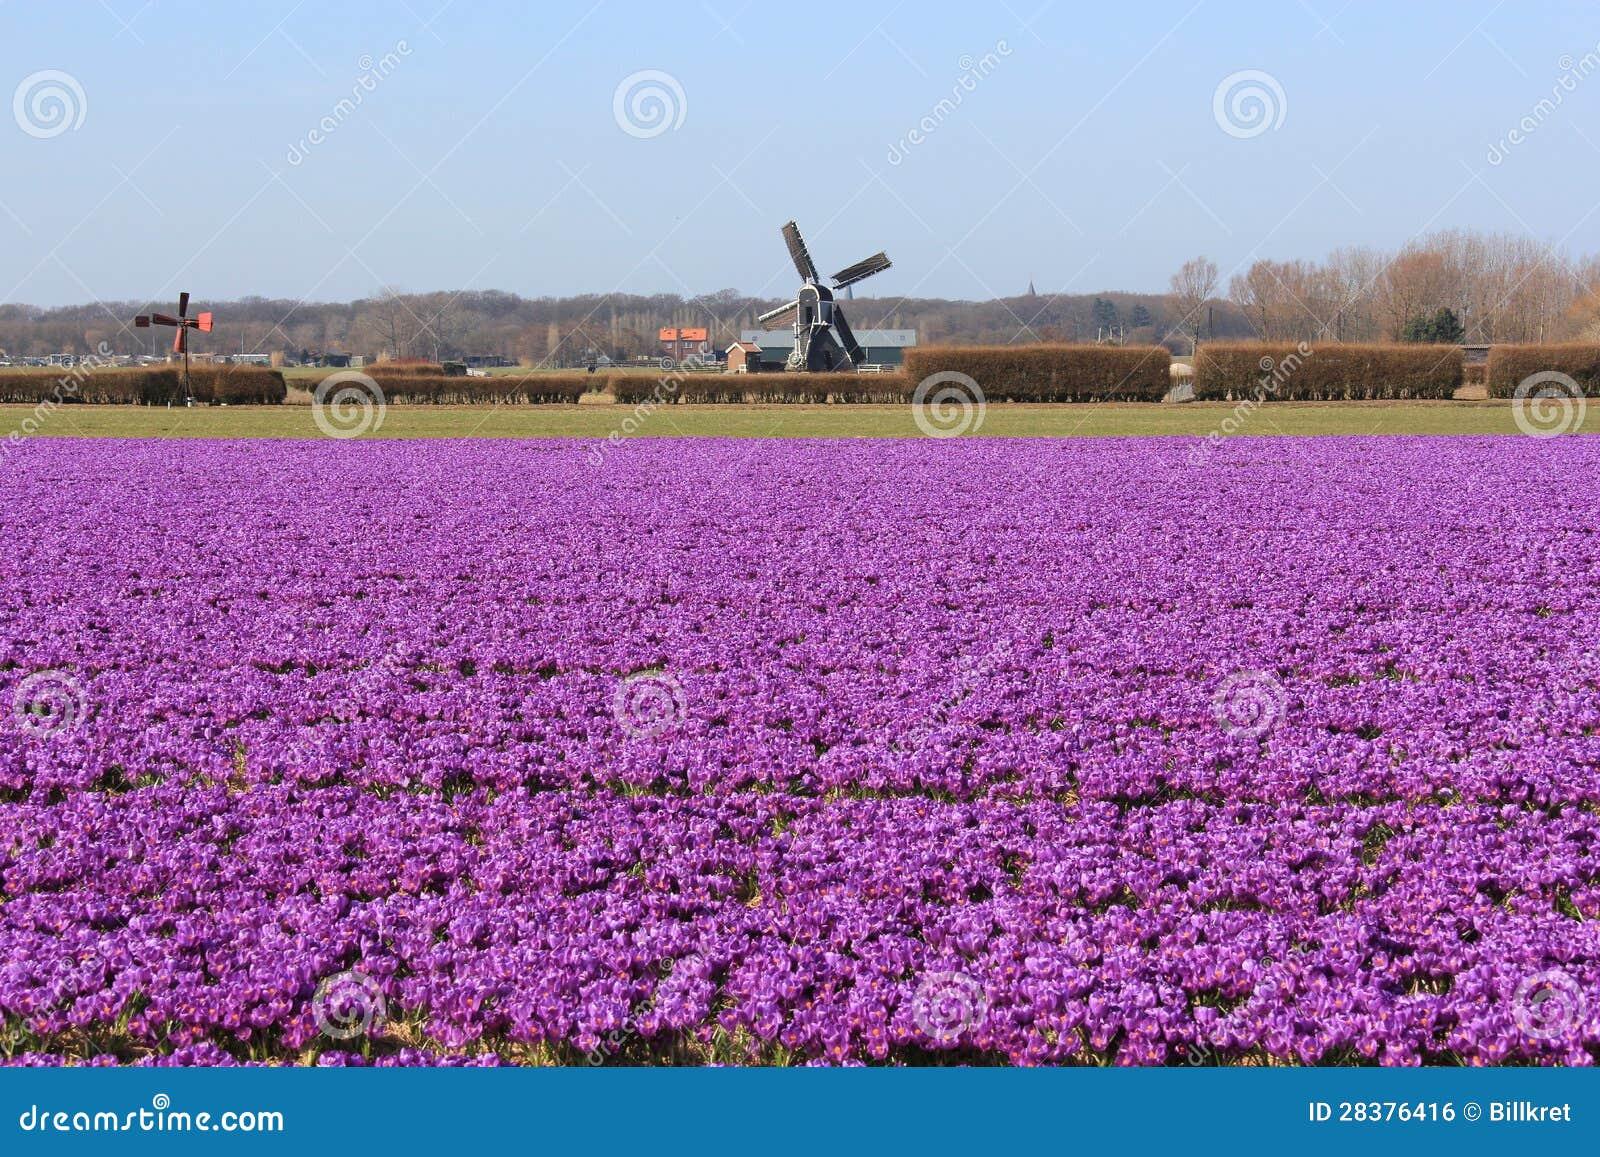 feld mit sch nen purpurroten blumen in holland lizenzfreies stockbild bild 28376416. Black Bedroom Furniture Sets. Home Design Ideas